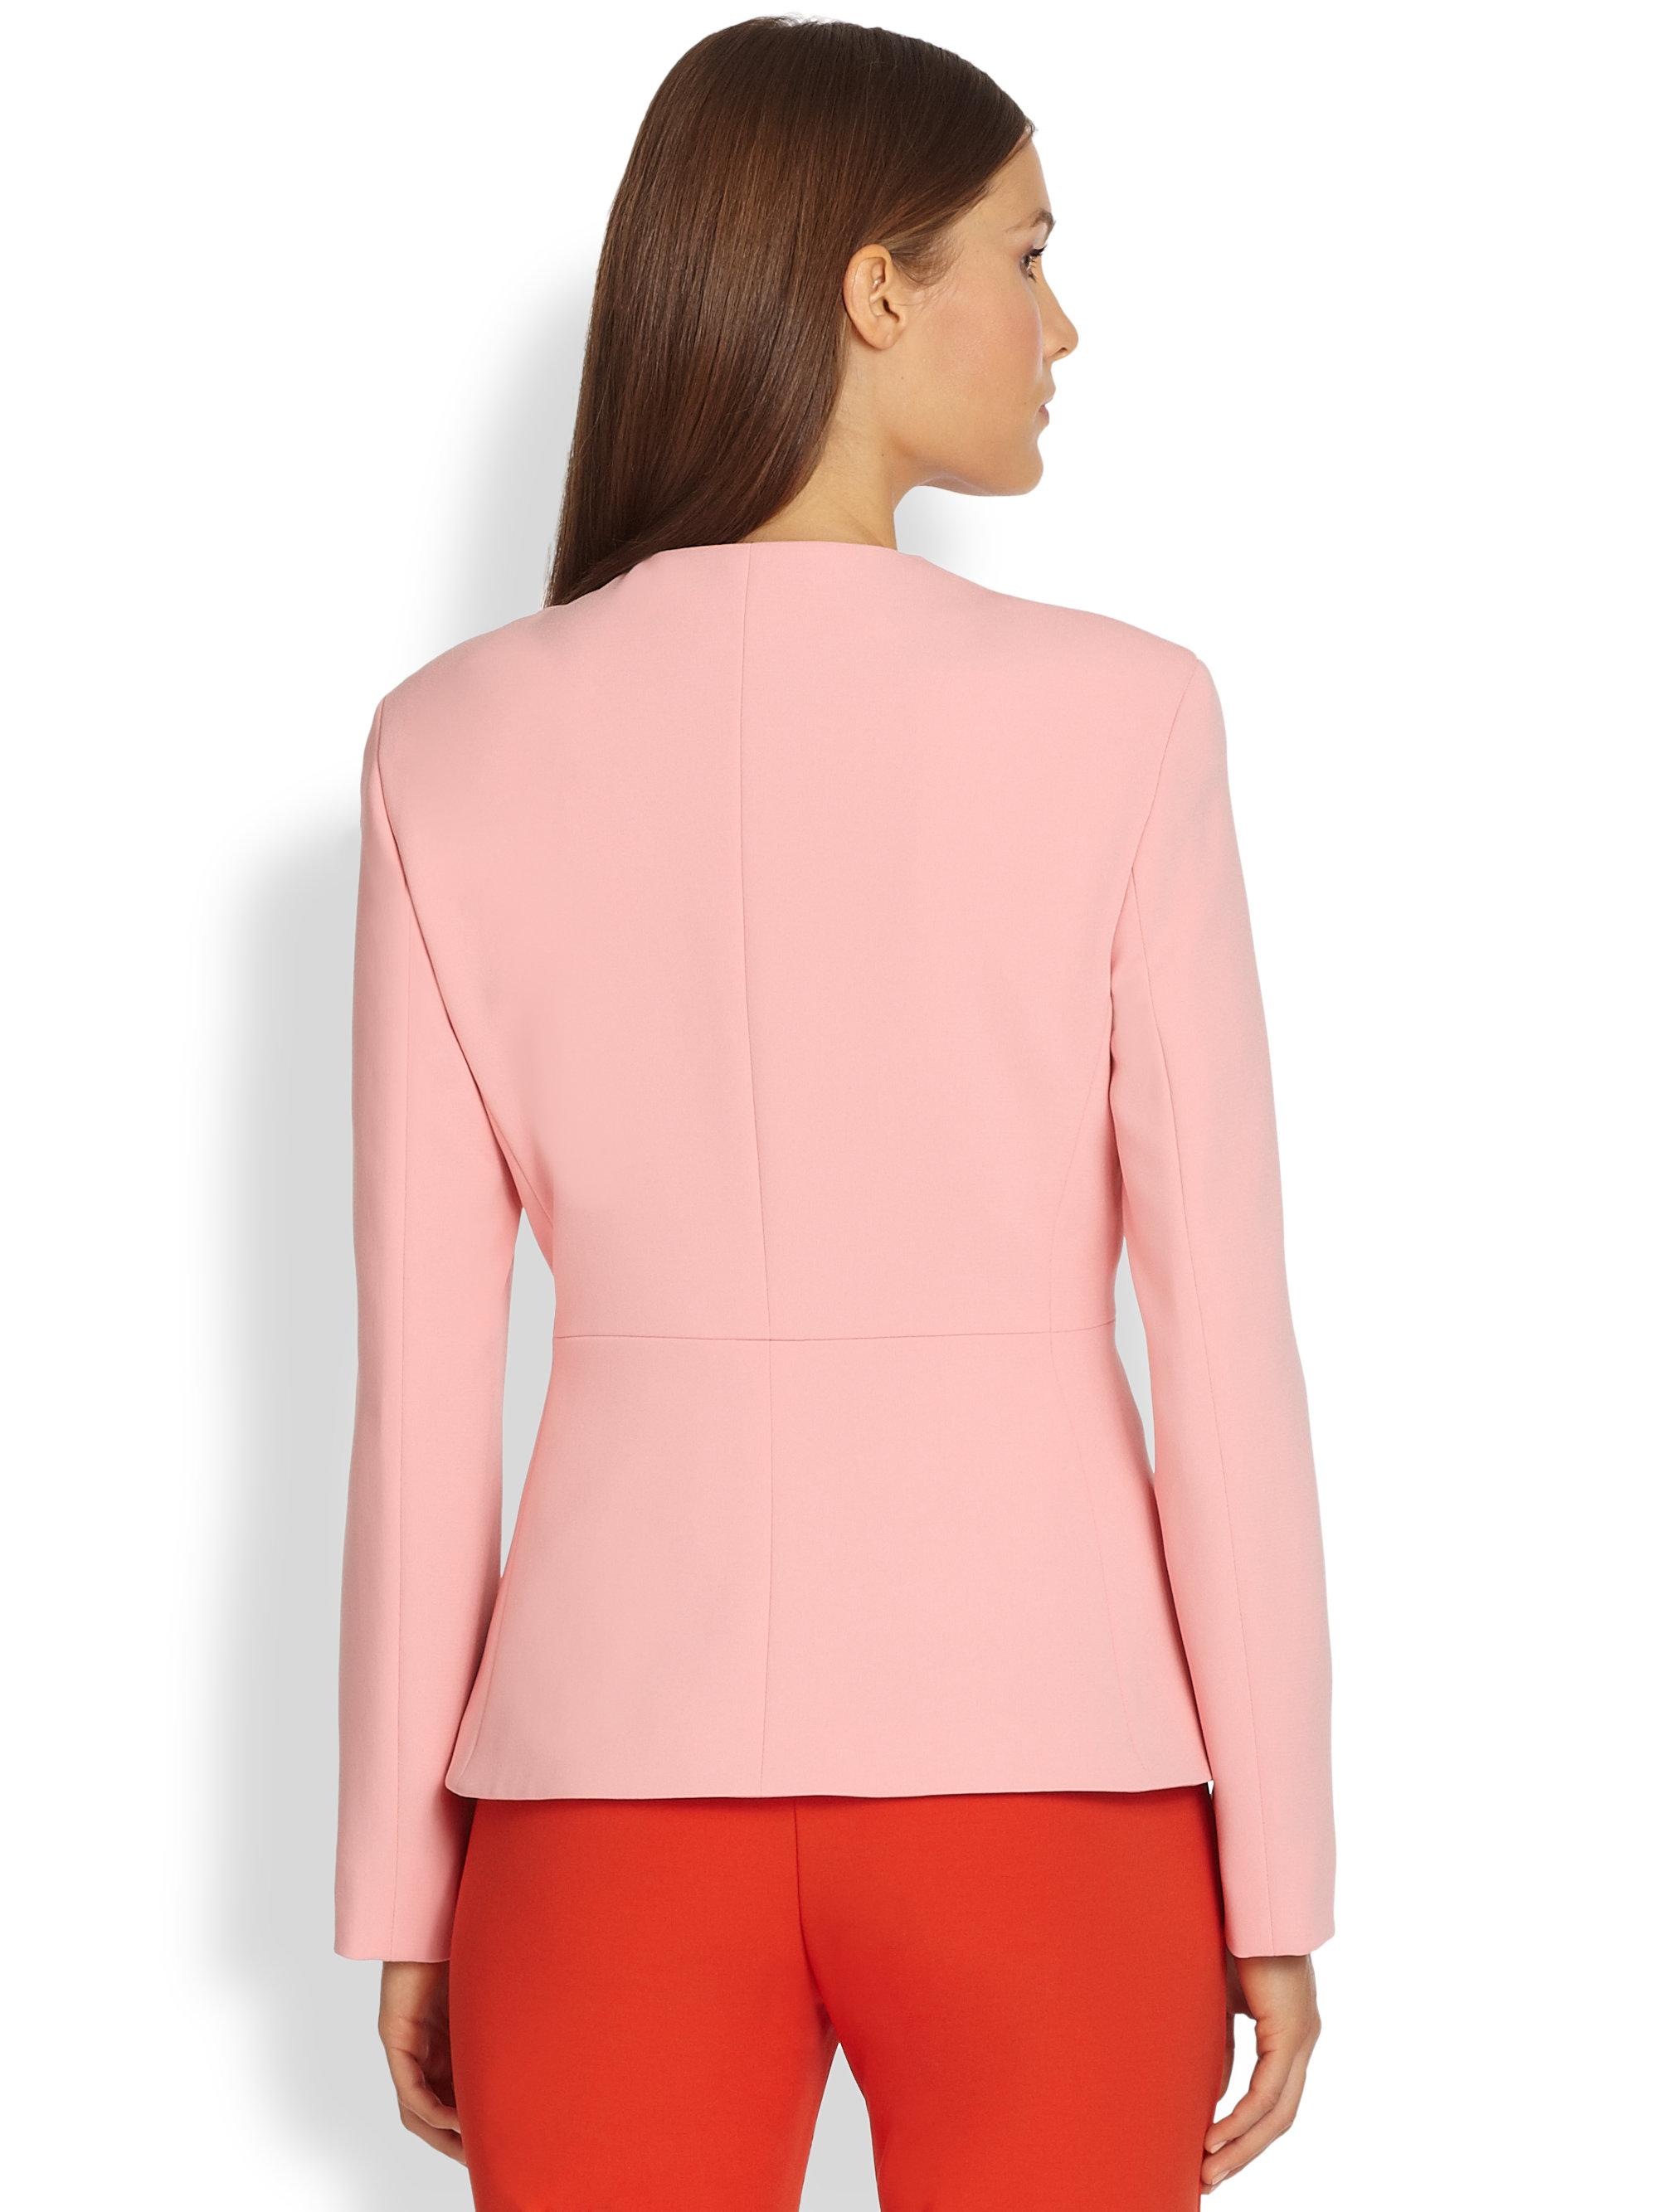 Max mara Collarless Jacket in Pink | Lyst